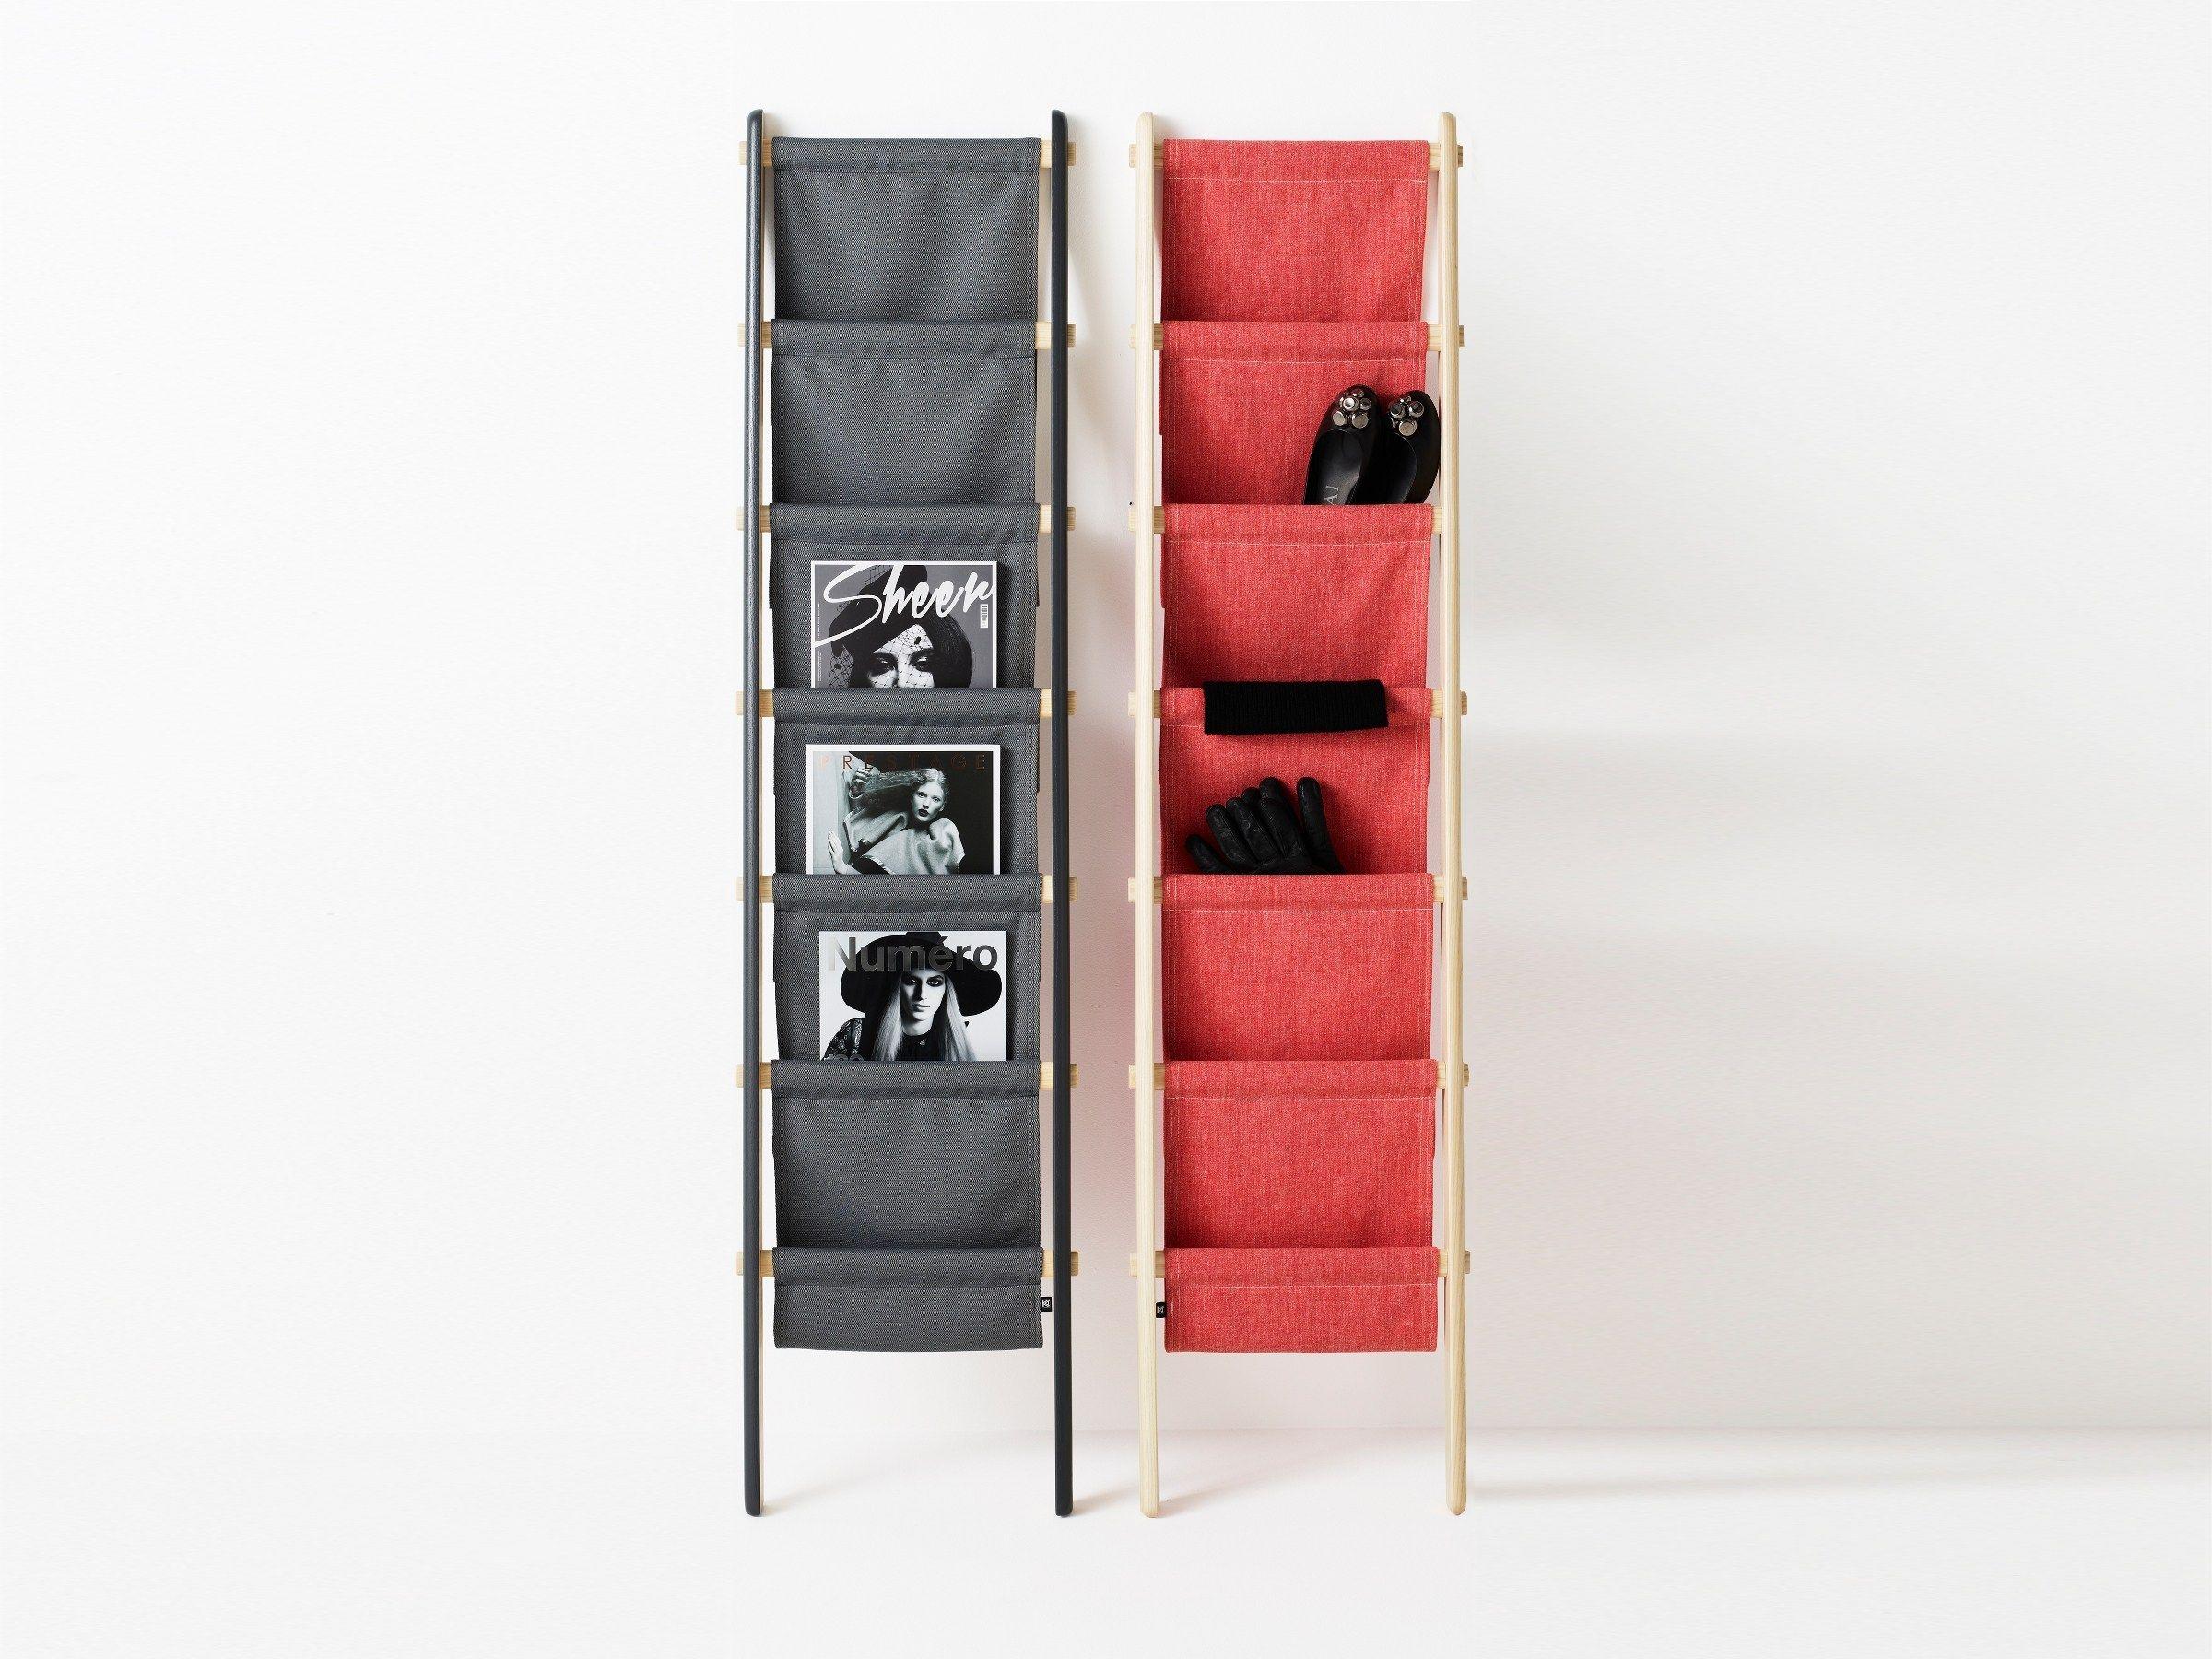 Design Zeitungsständer Holz ~   HOLZ PLISADO BY KARL ANDERSSON & SÖNER  DESIGN NOTE DESIGN STUDIO